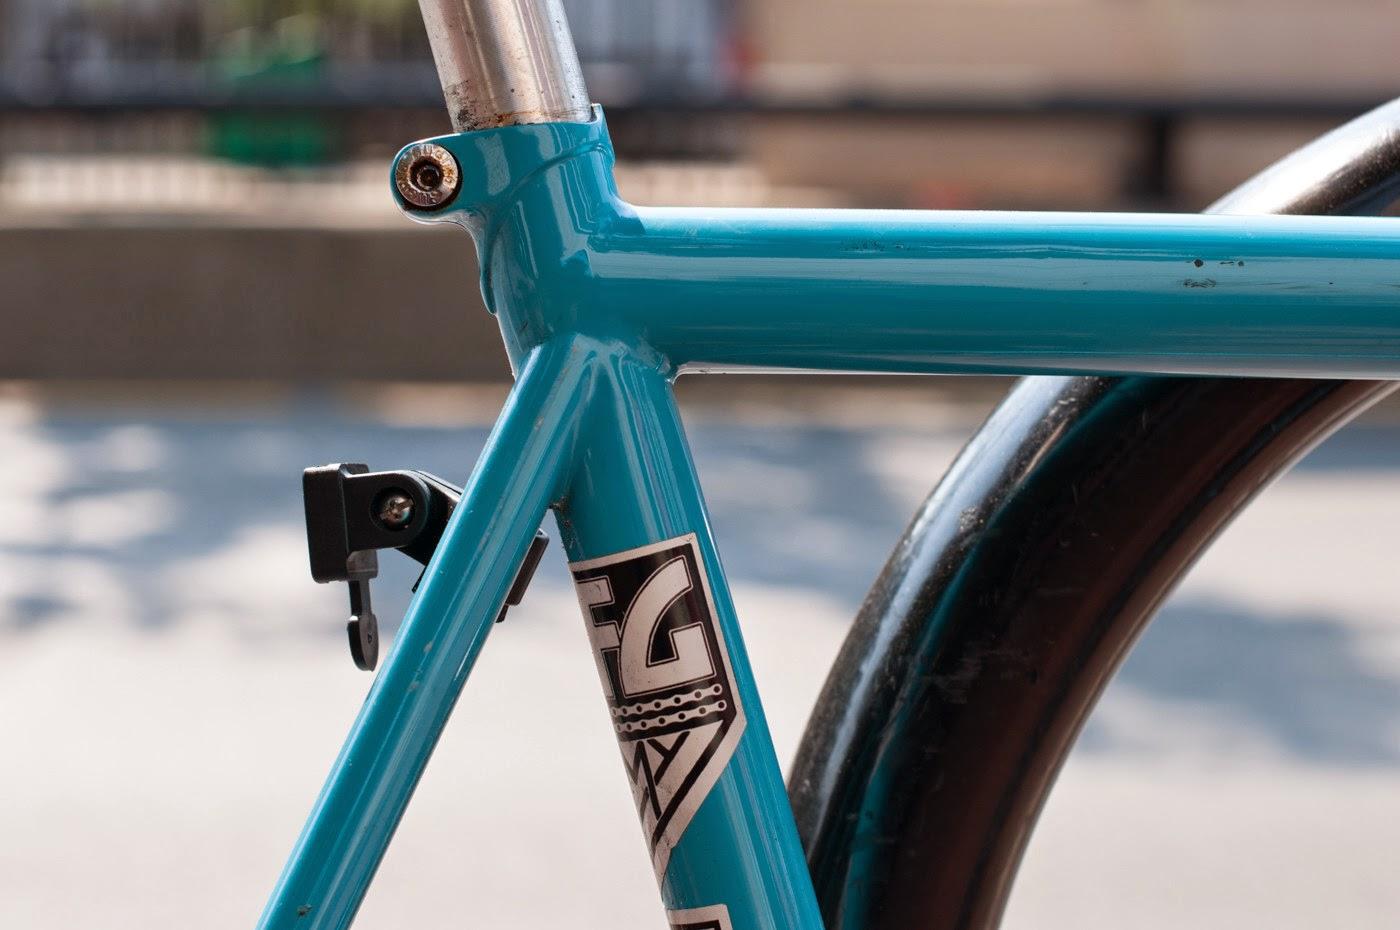 Fixie, fixed speed, bicycle, boston, USA, custom, customised, blue, tim Macauley, the biketorialist, shimano, frame, 3t, ritchey, tiagra , seat tube,